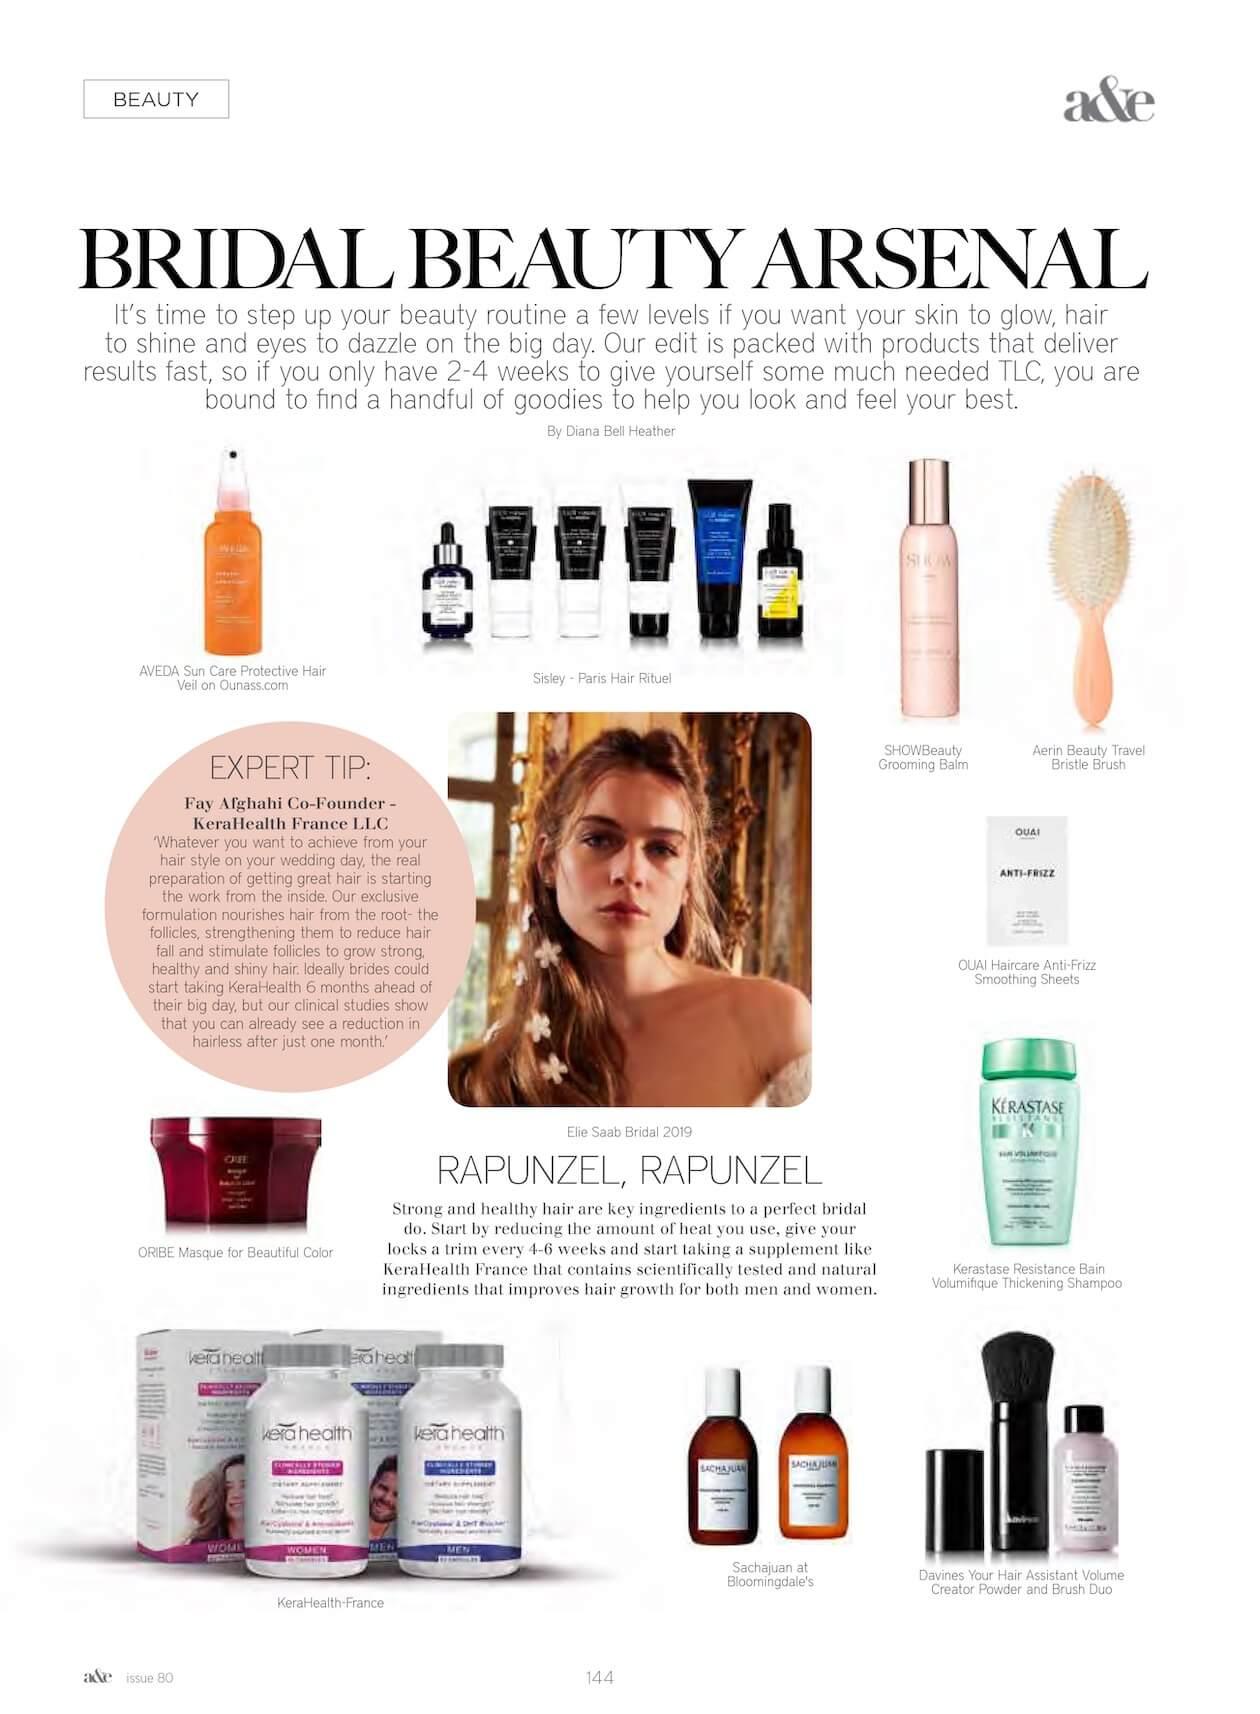 Bridal beauty arsenal